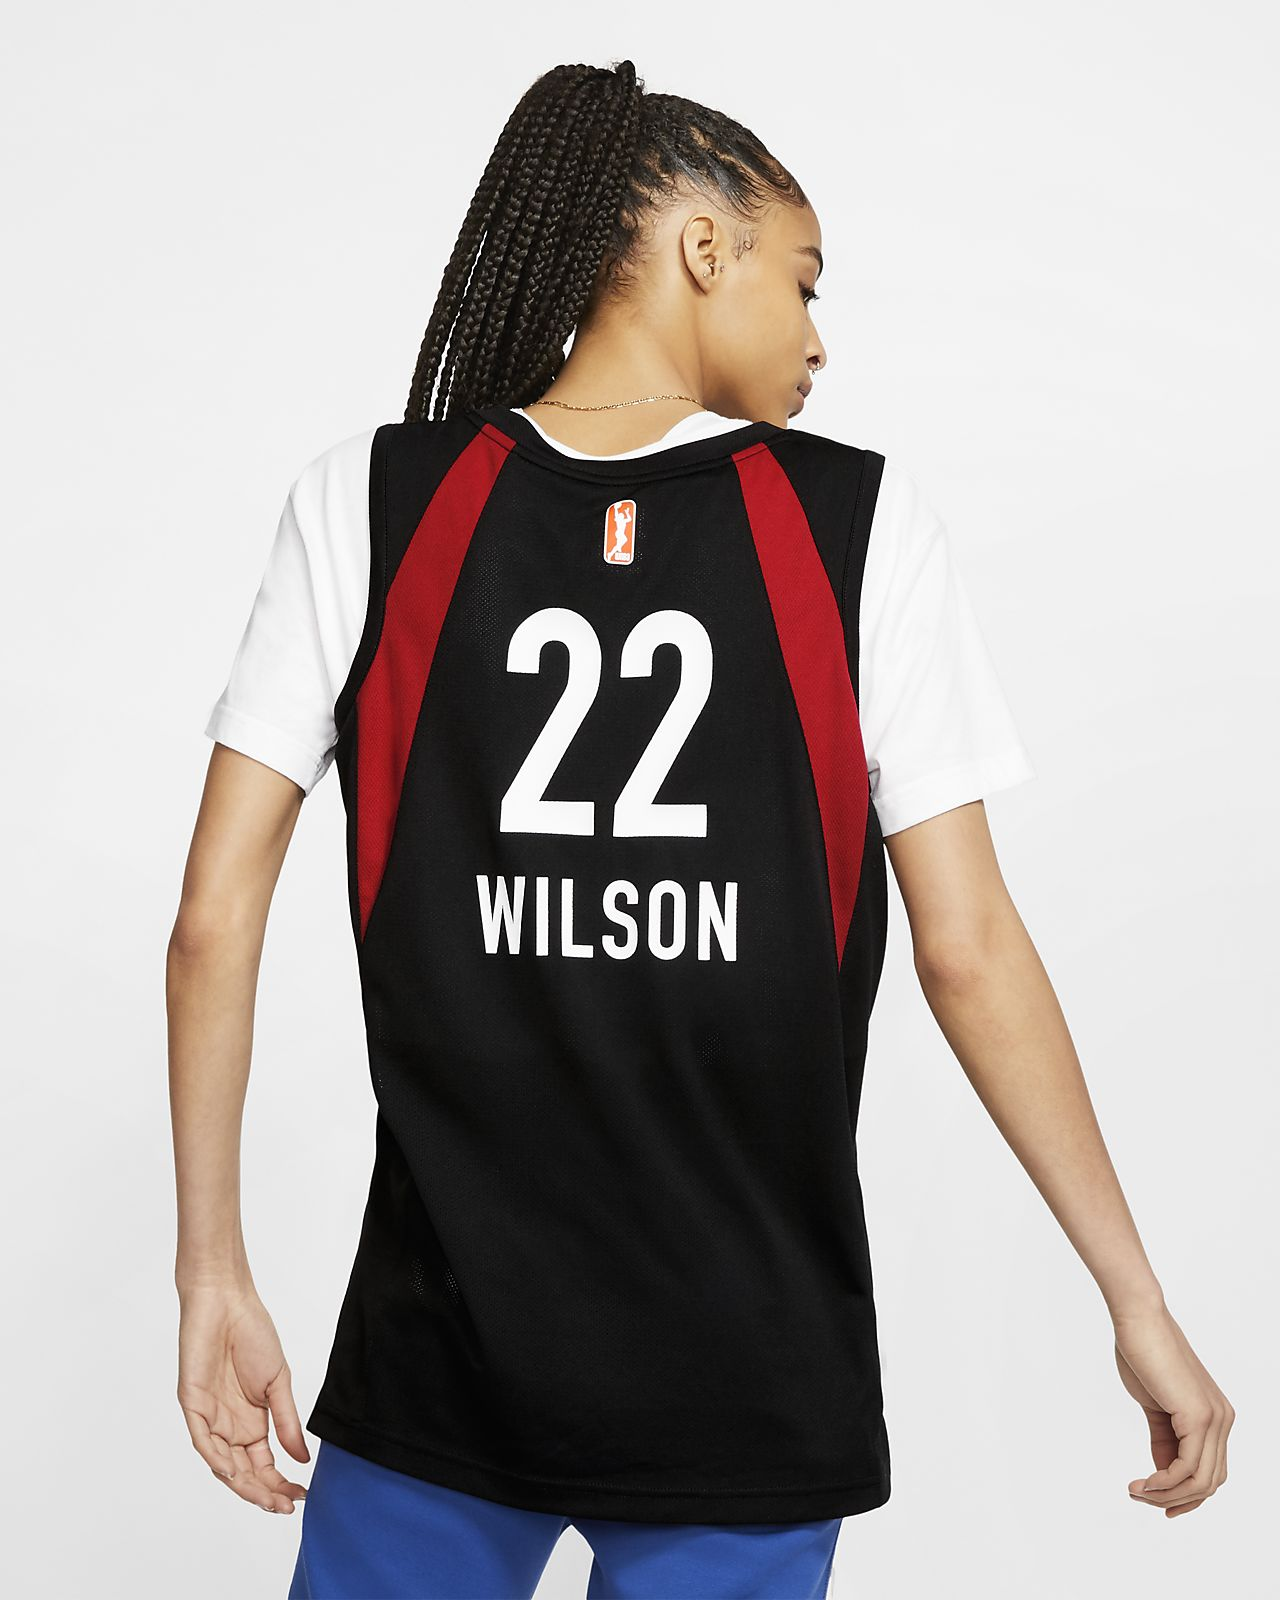 7a7d87ec9ae A'ja Wilson Las Vegas Aces Nike WNBA Basketball Jersey. Nike.com